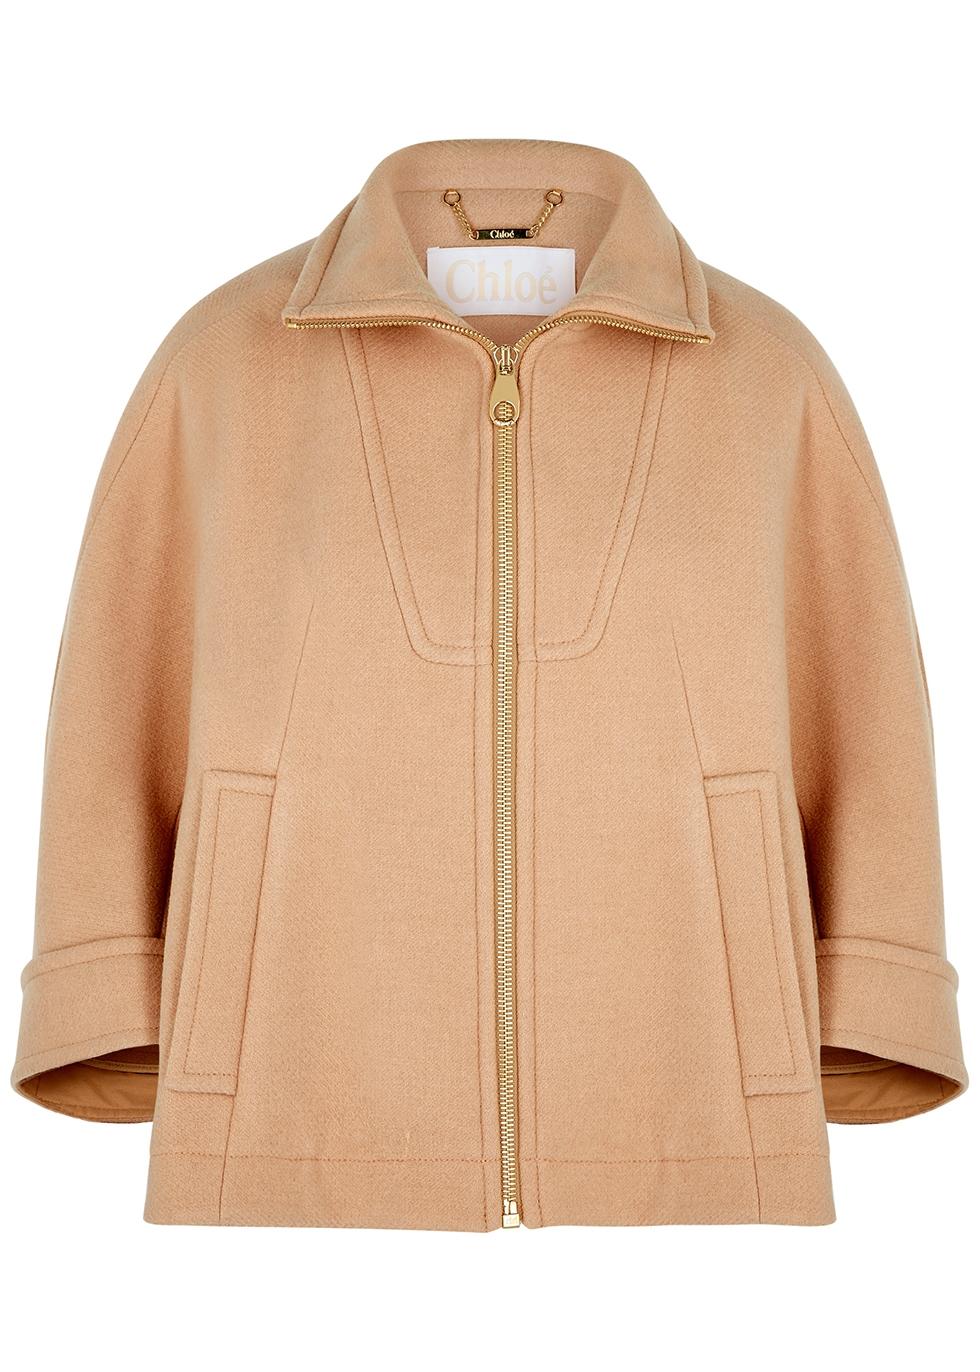 Blush wool-blend jacket